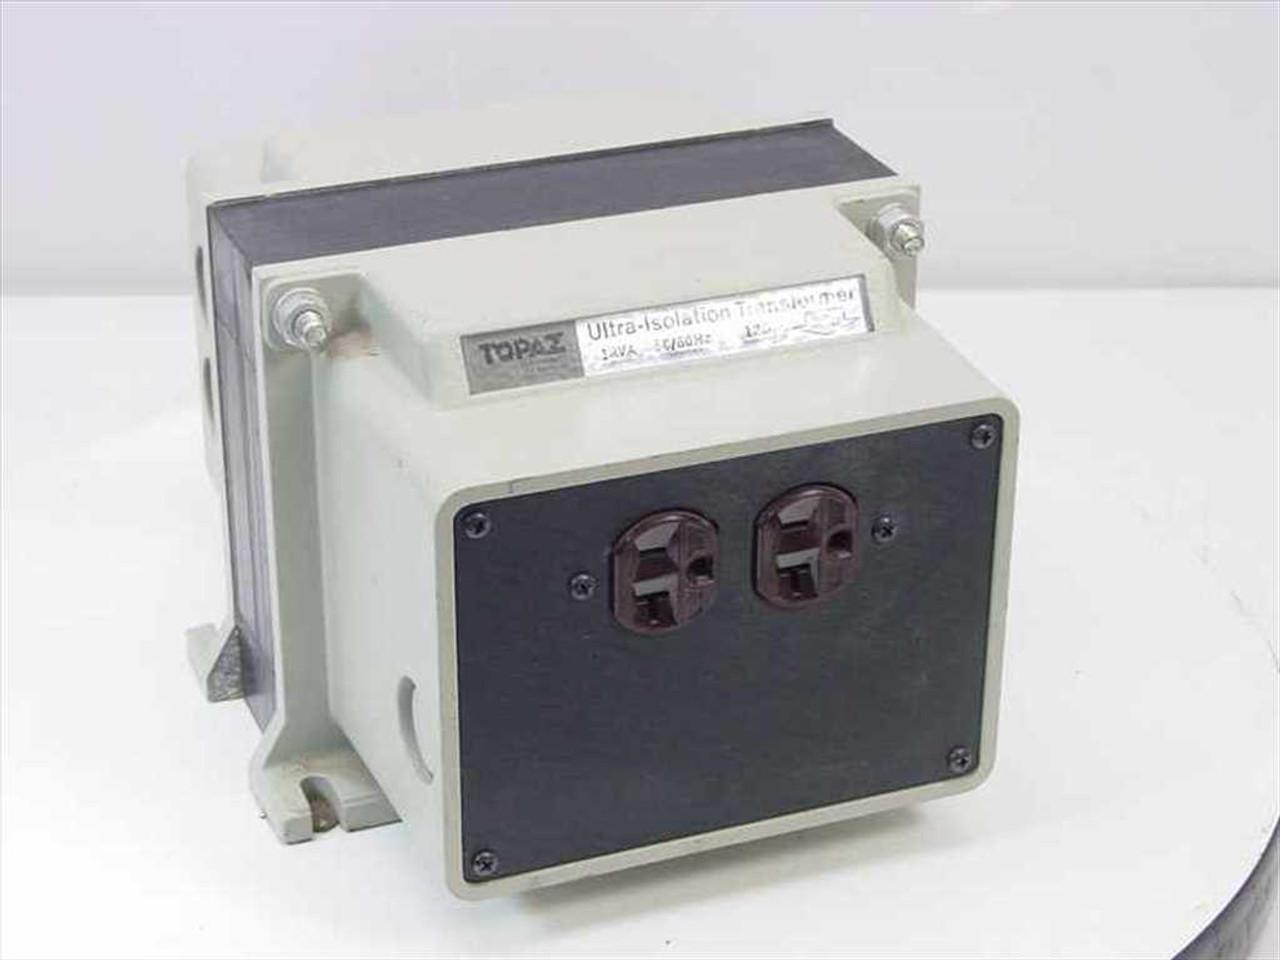 medium resolution of topaz electronics 91001 12 ultra isolation transformer noise suppressor